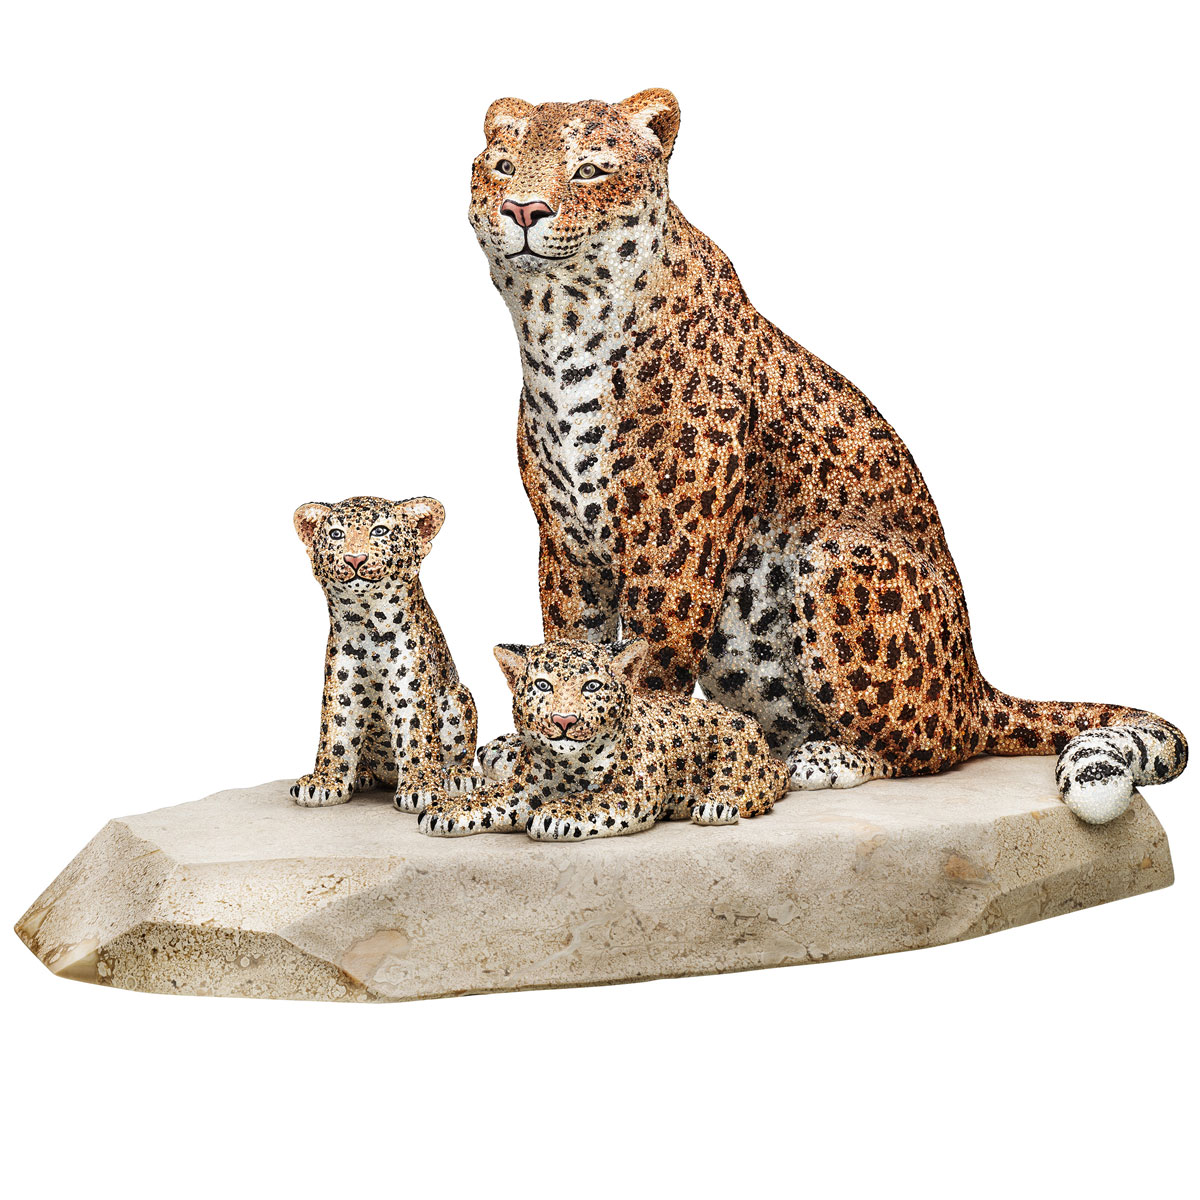 Swarovski Myriad Reka Leopards, Limited Edition